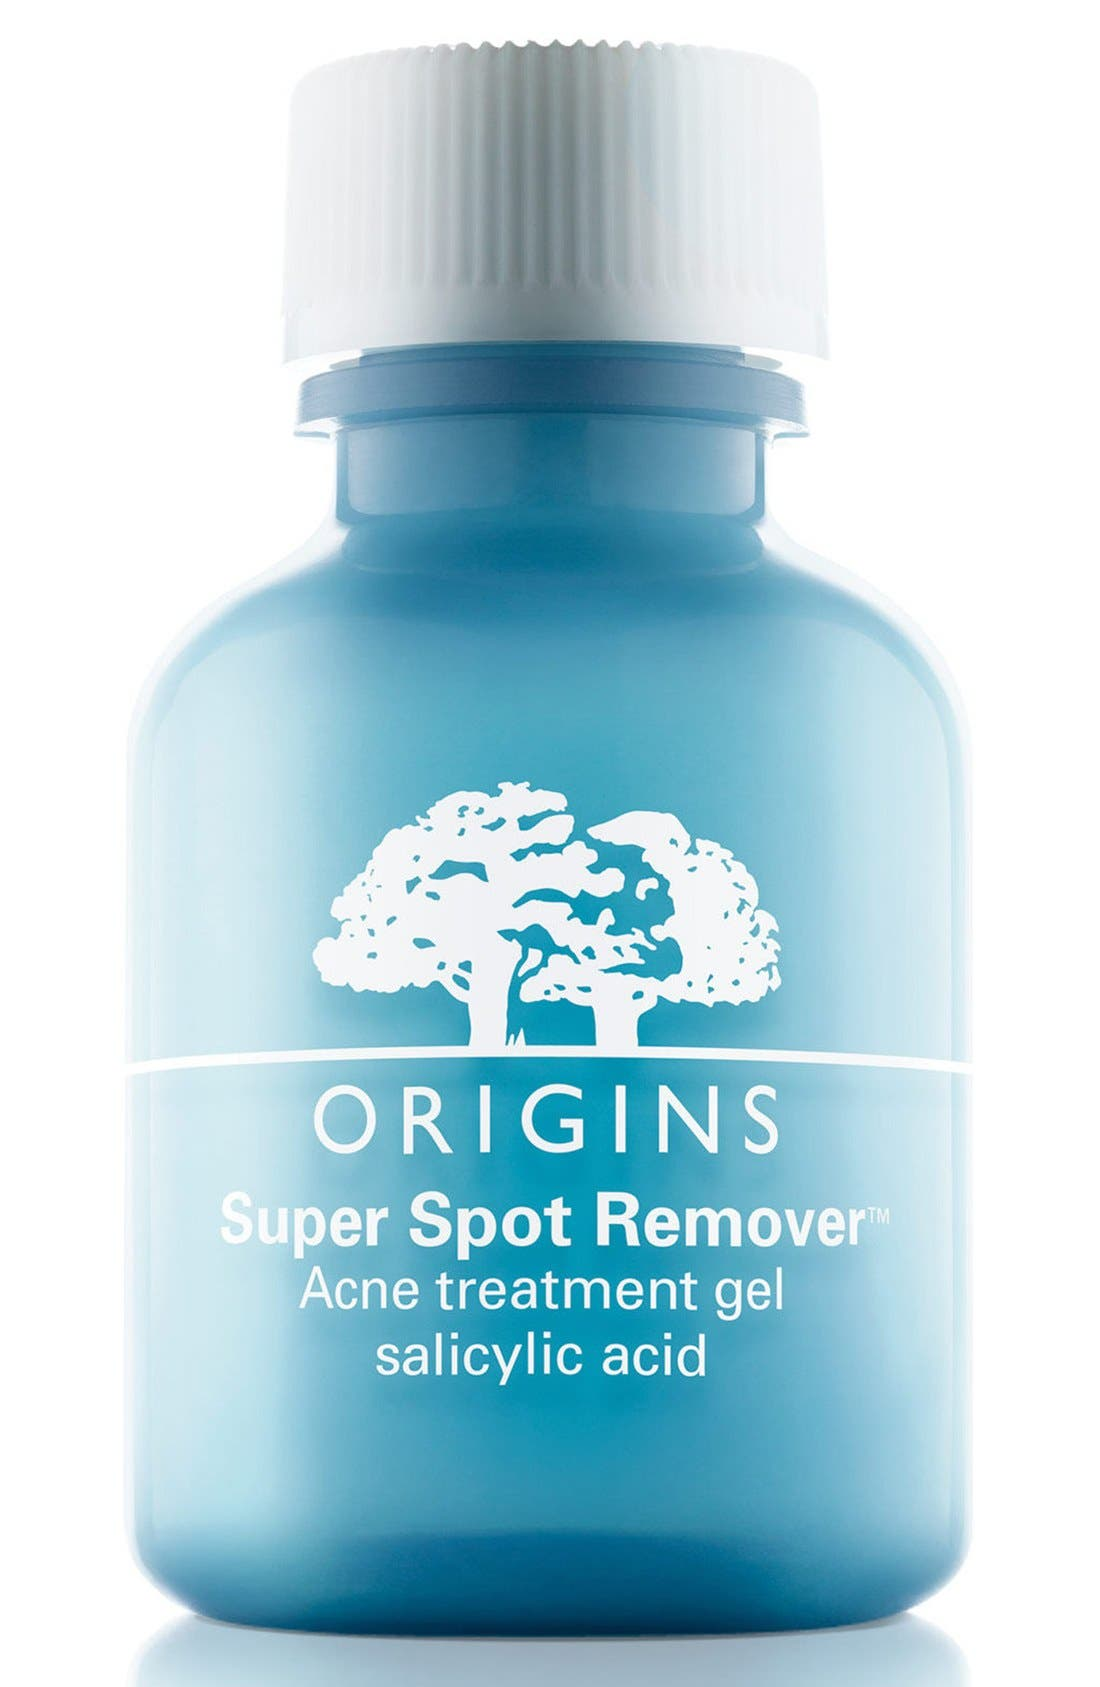 Origins Acne Treatment Gel